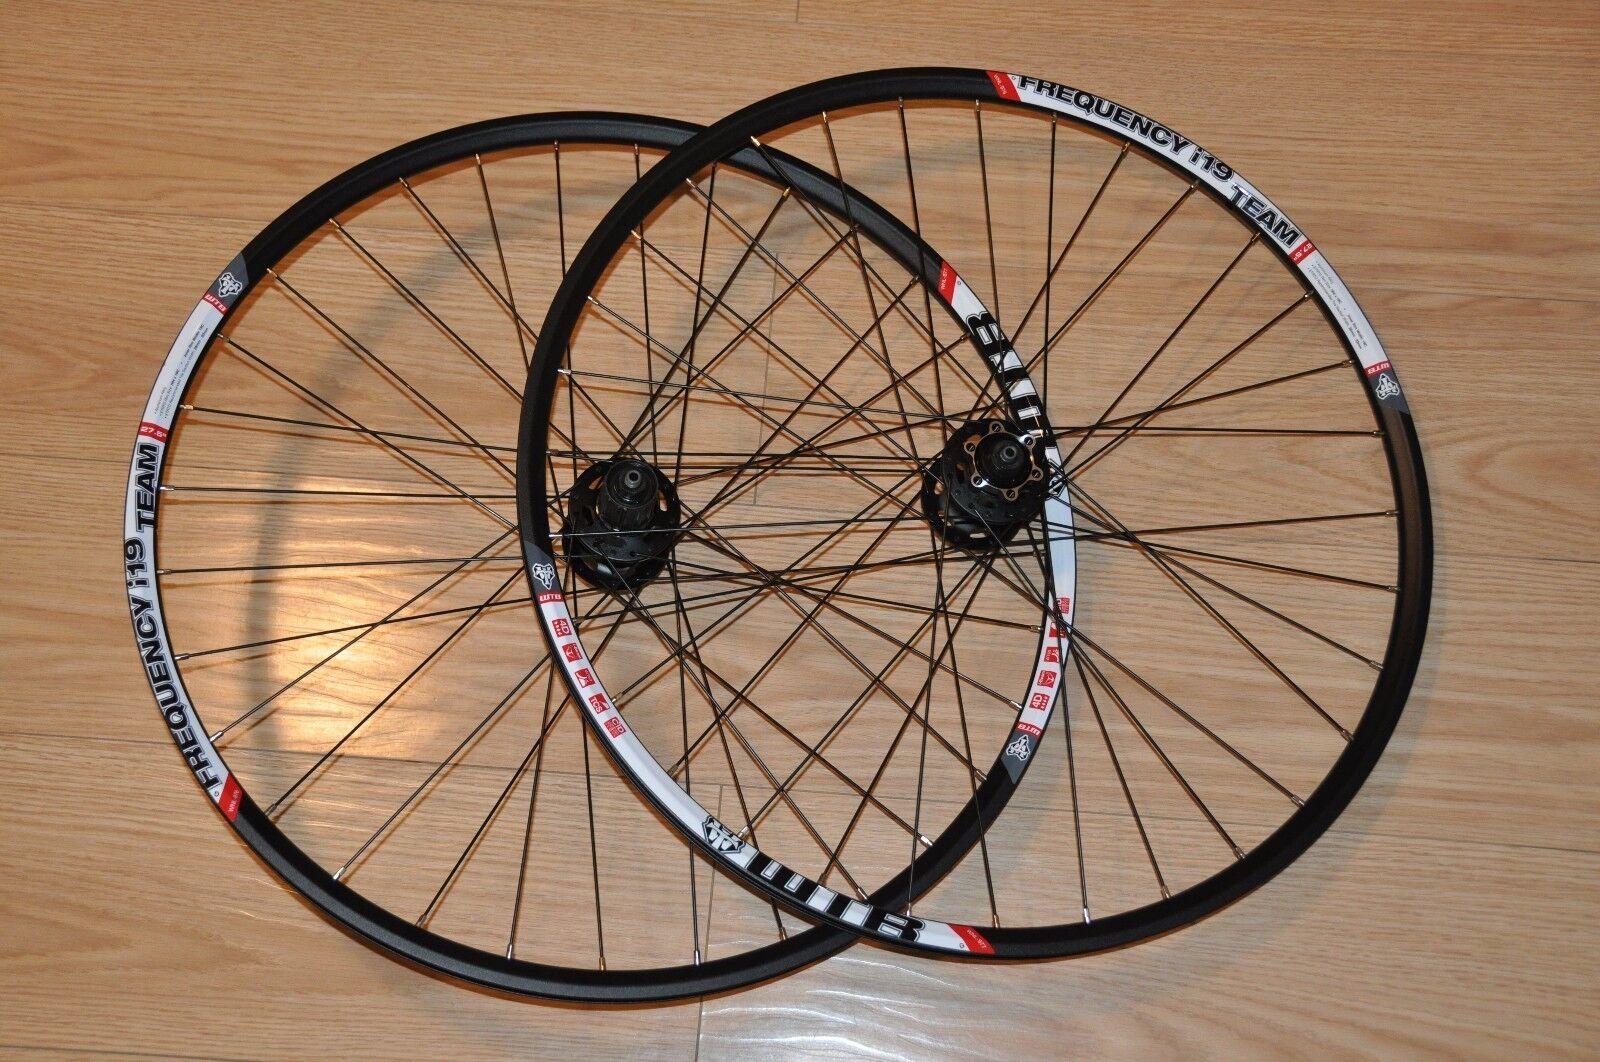 WTB Frequency i-19 650B 27.5 Rims on shimano xt 6 bolt disc set of wheels 32